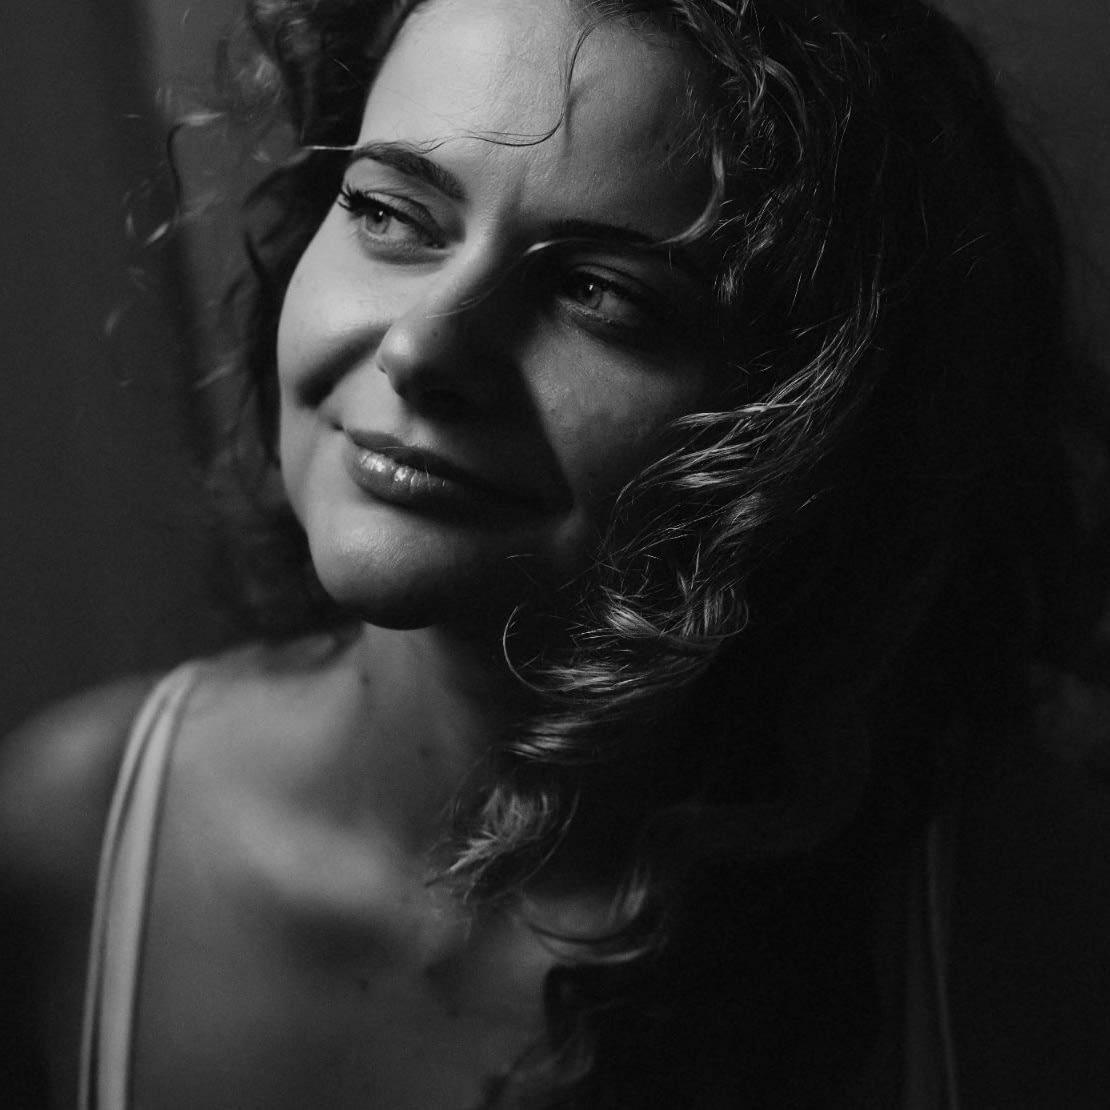 alina-botica-fotograf-portret-irina-bescuca-rawyou-8